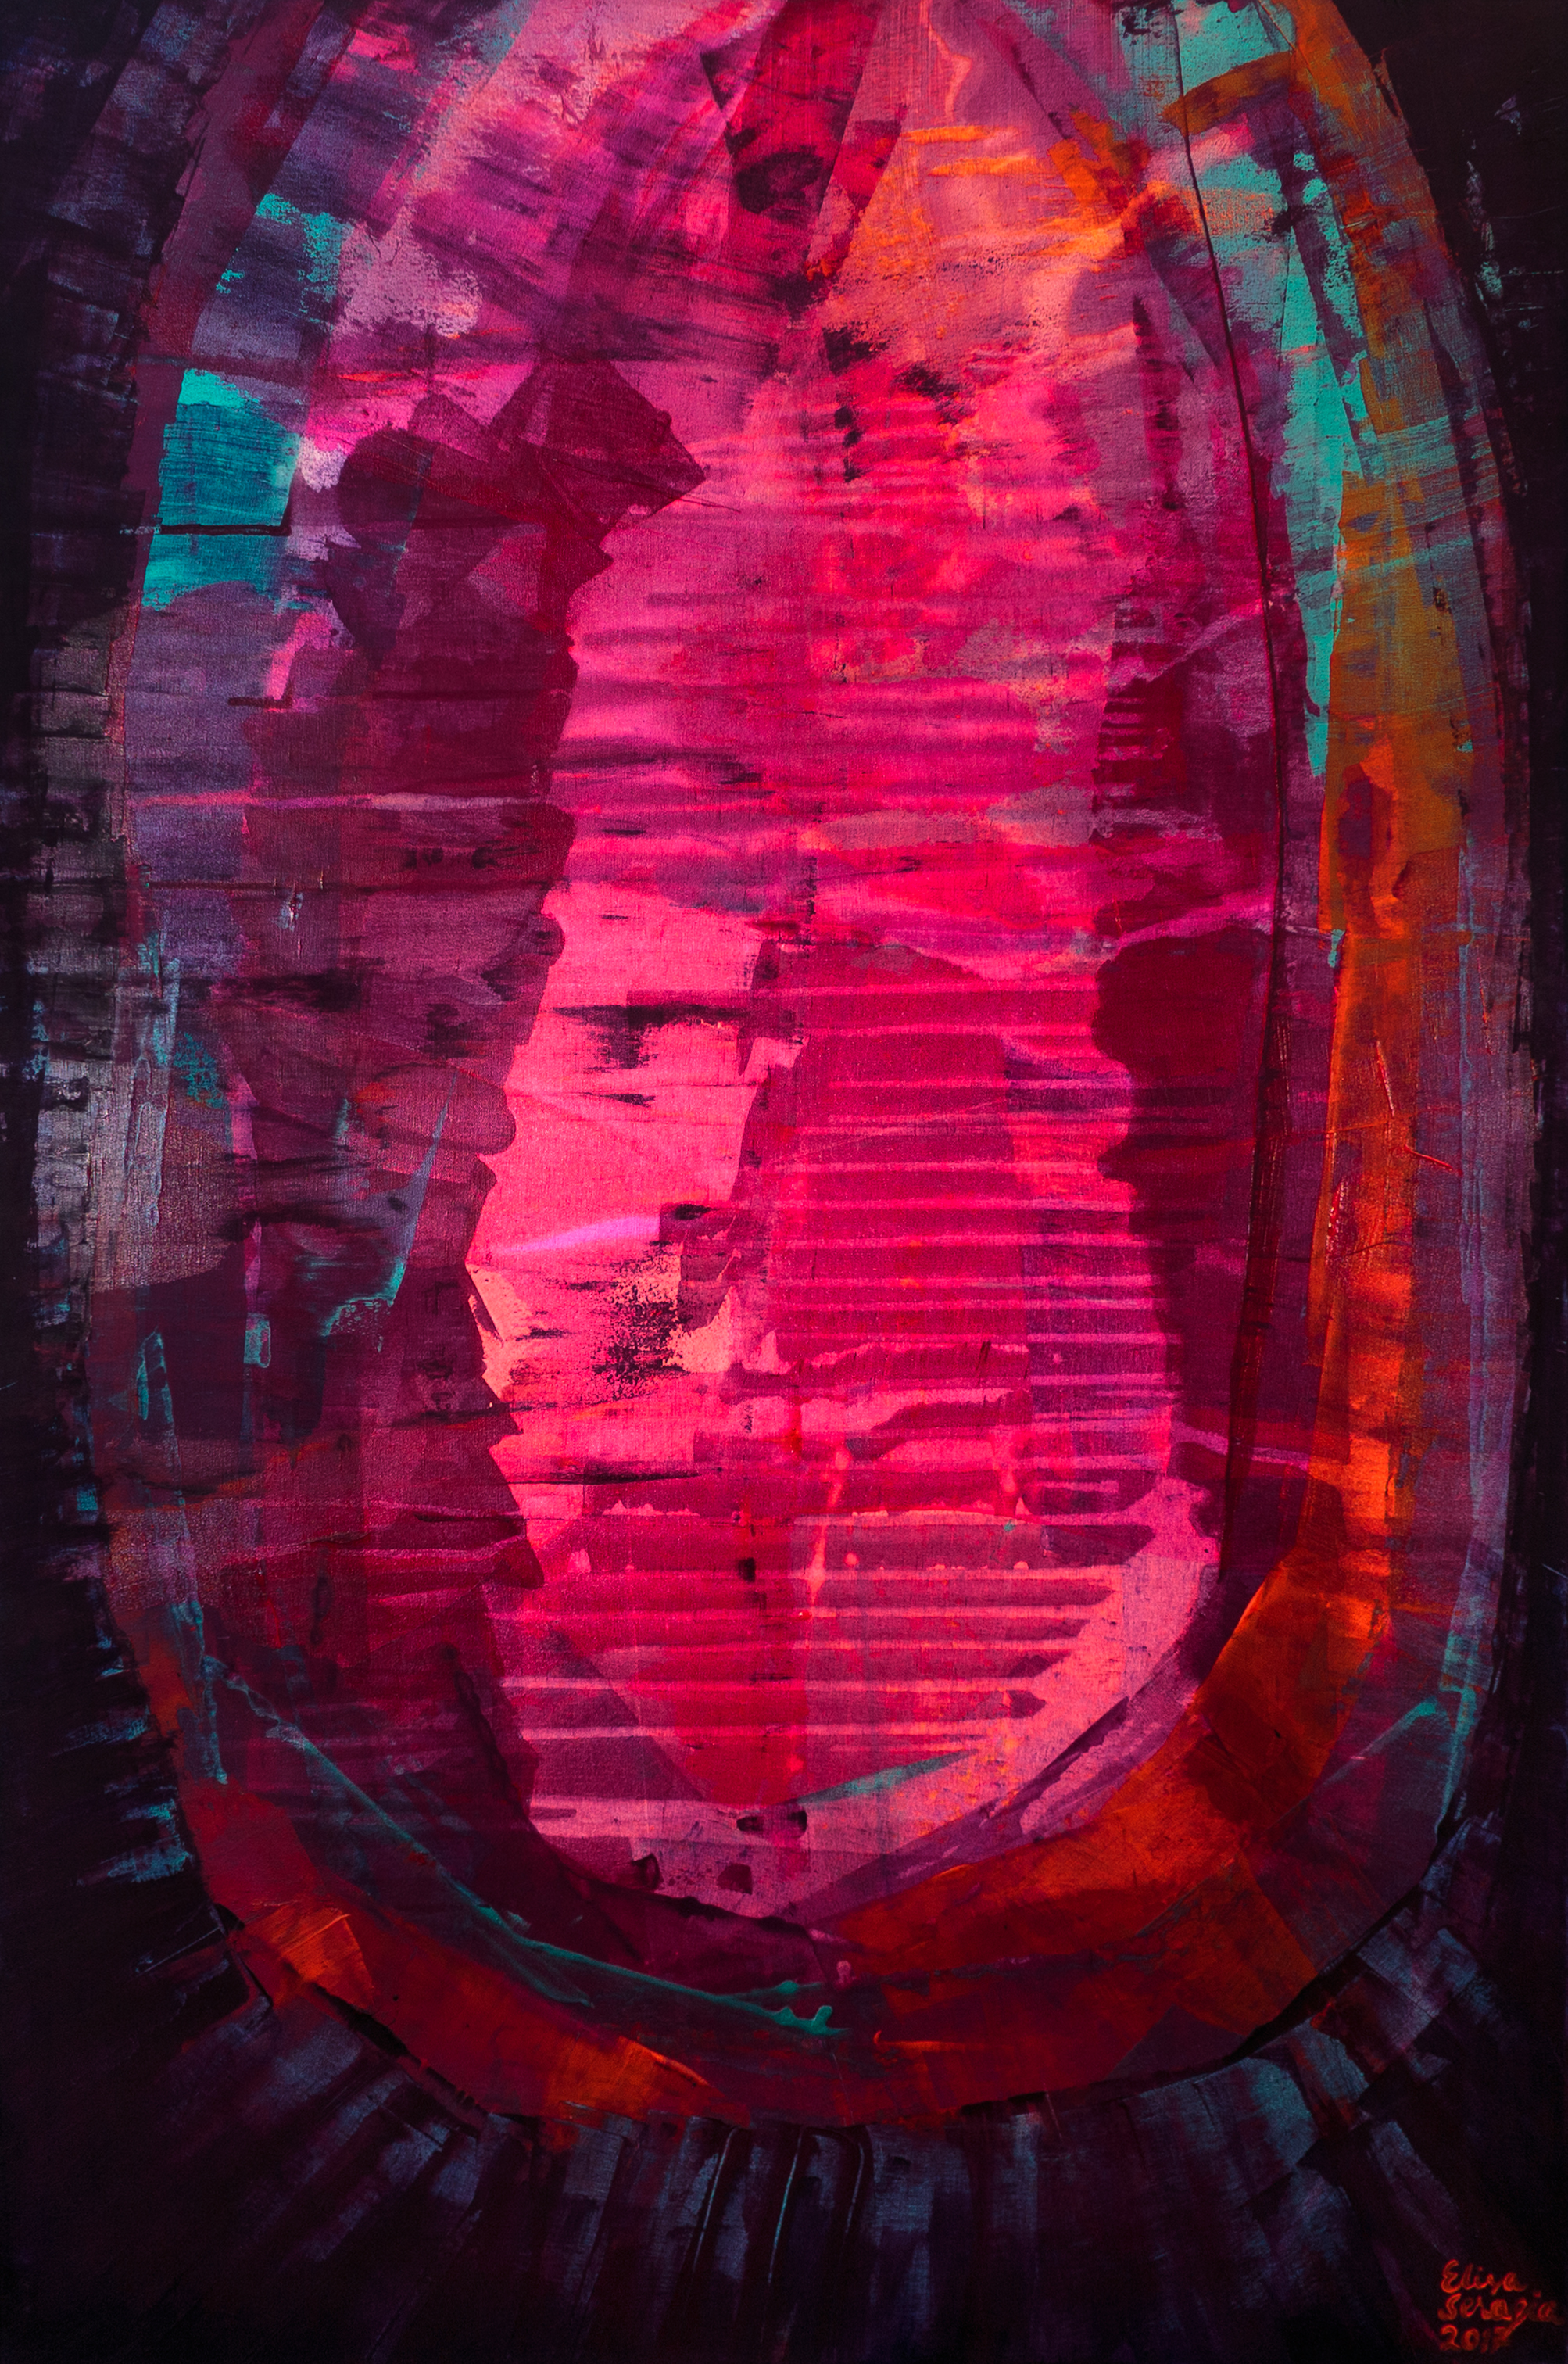 Amethyst, Akryyli kankaalle, 150 cm x 100 cm  Myynnissä / For sale